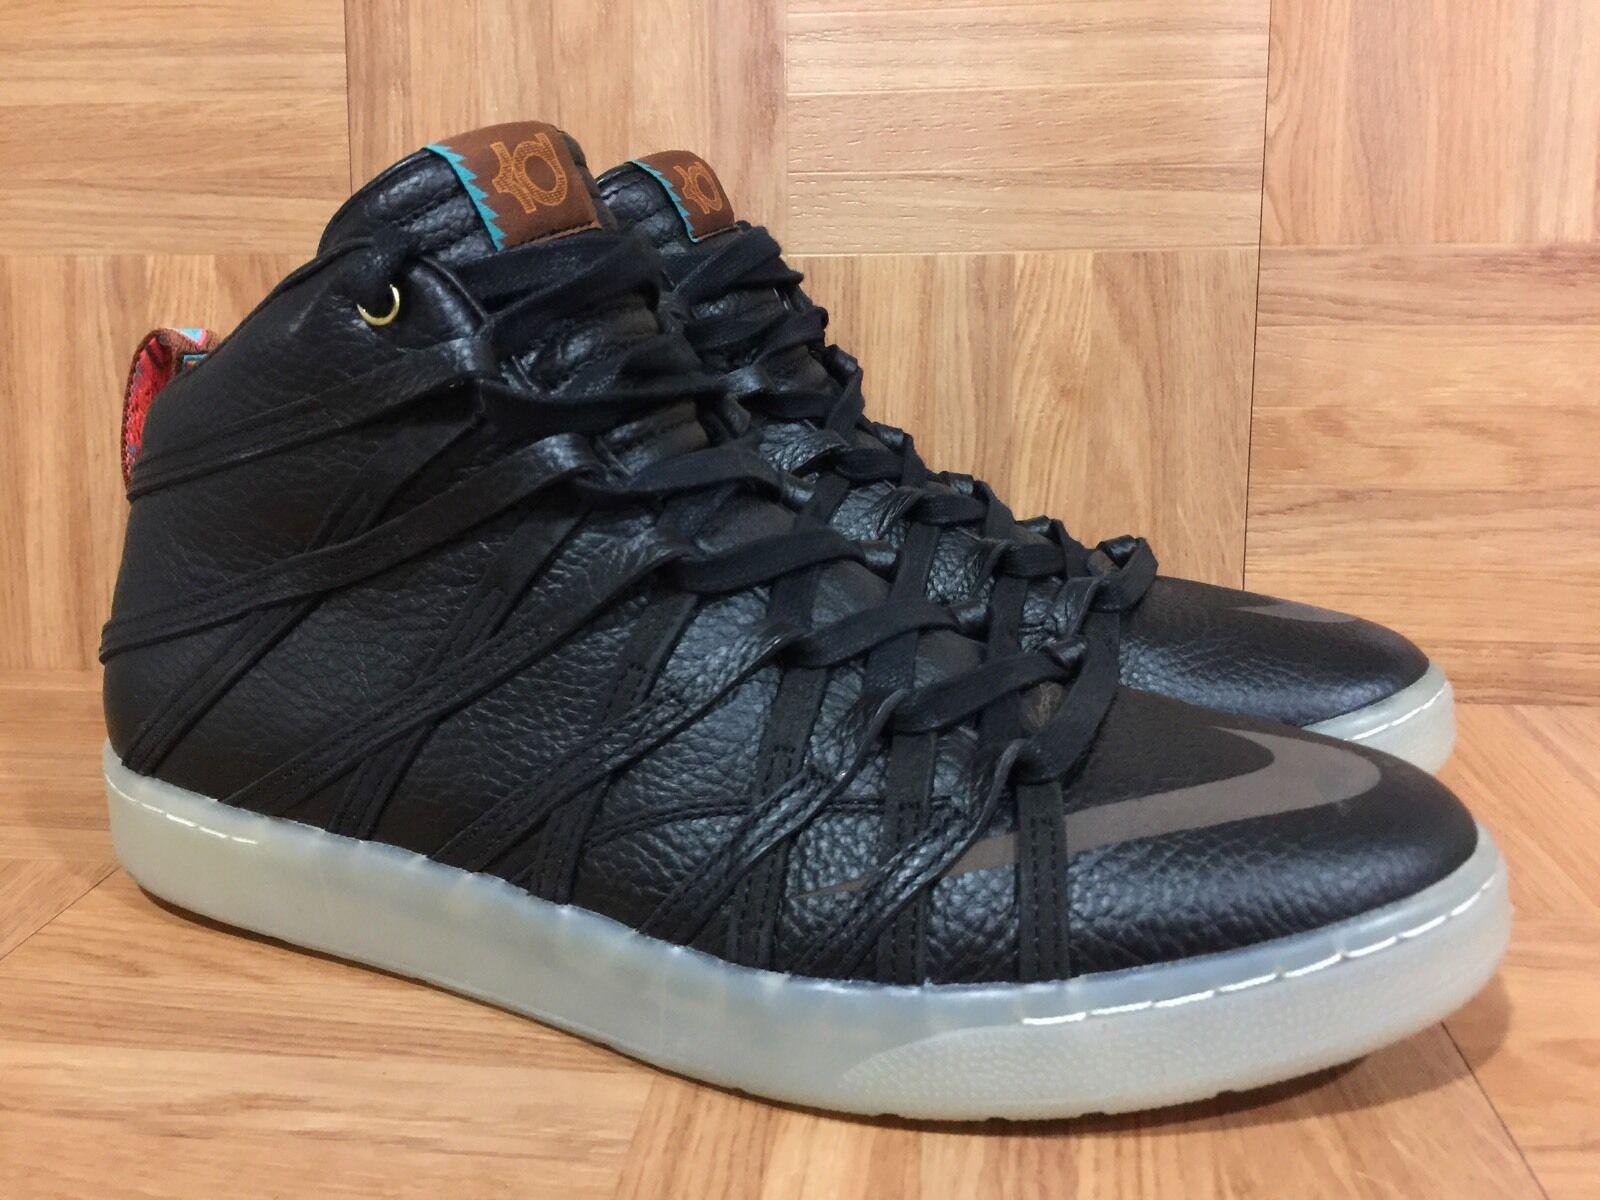 RARE Nike KD VII NSW Lifestyle Black Metallic gold Leather 12 653871-001 LE